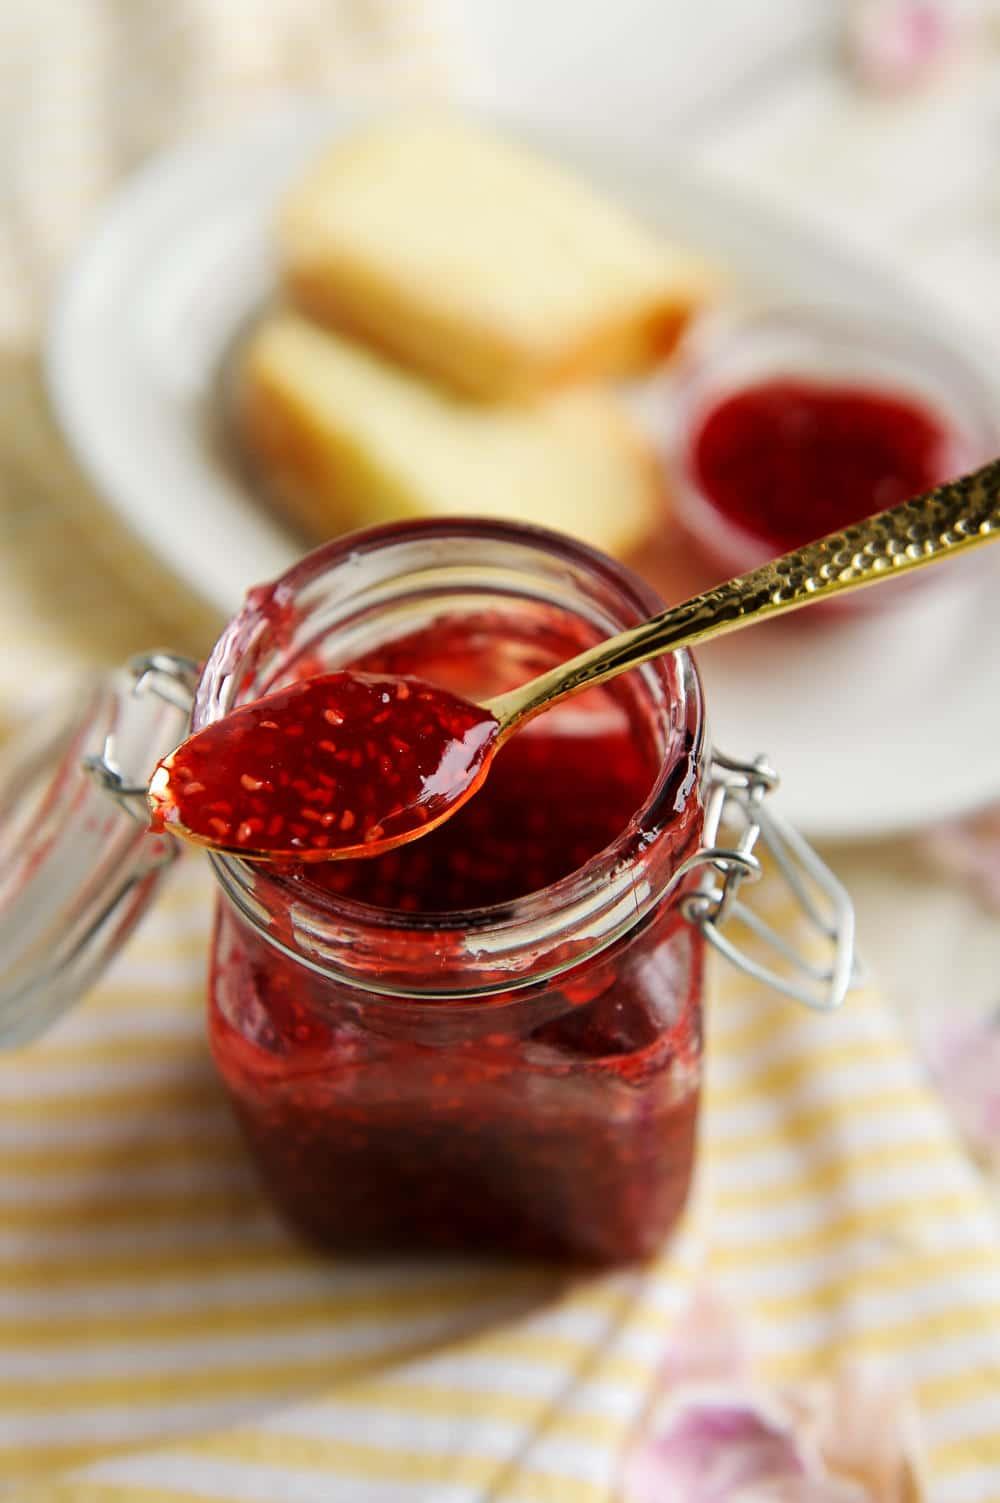 raspberry filling